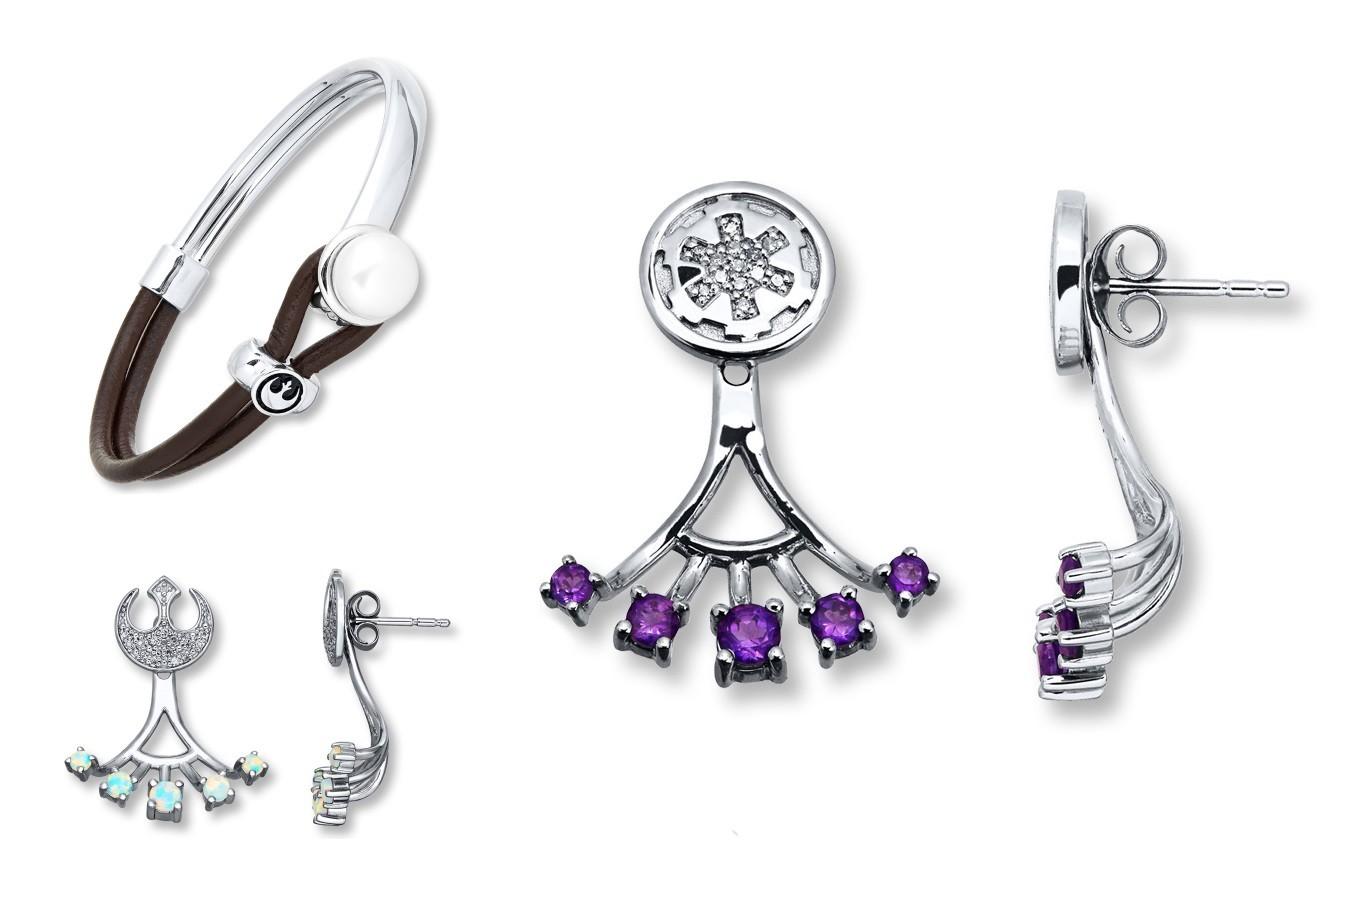 New Kay Jewelers x Star Wars jewelry